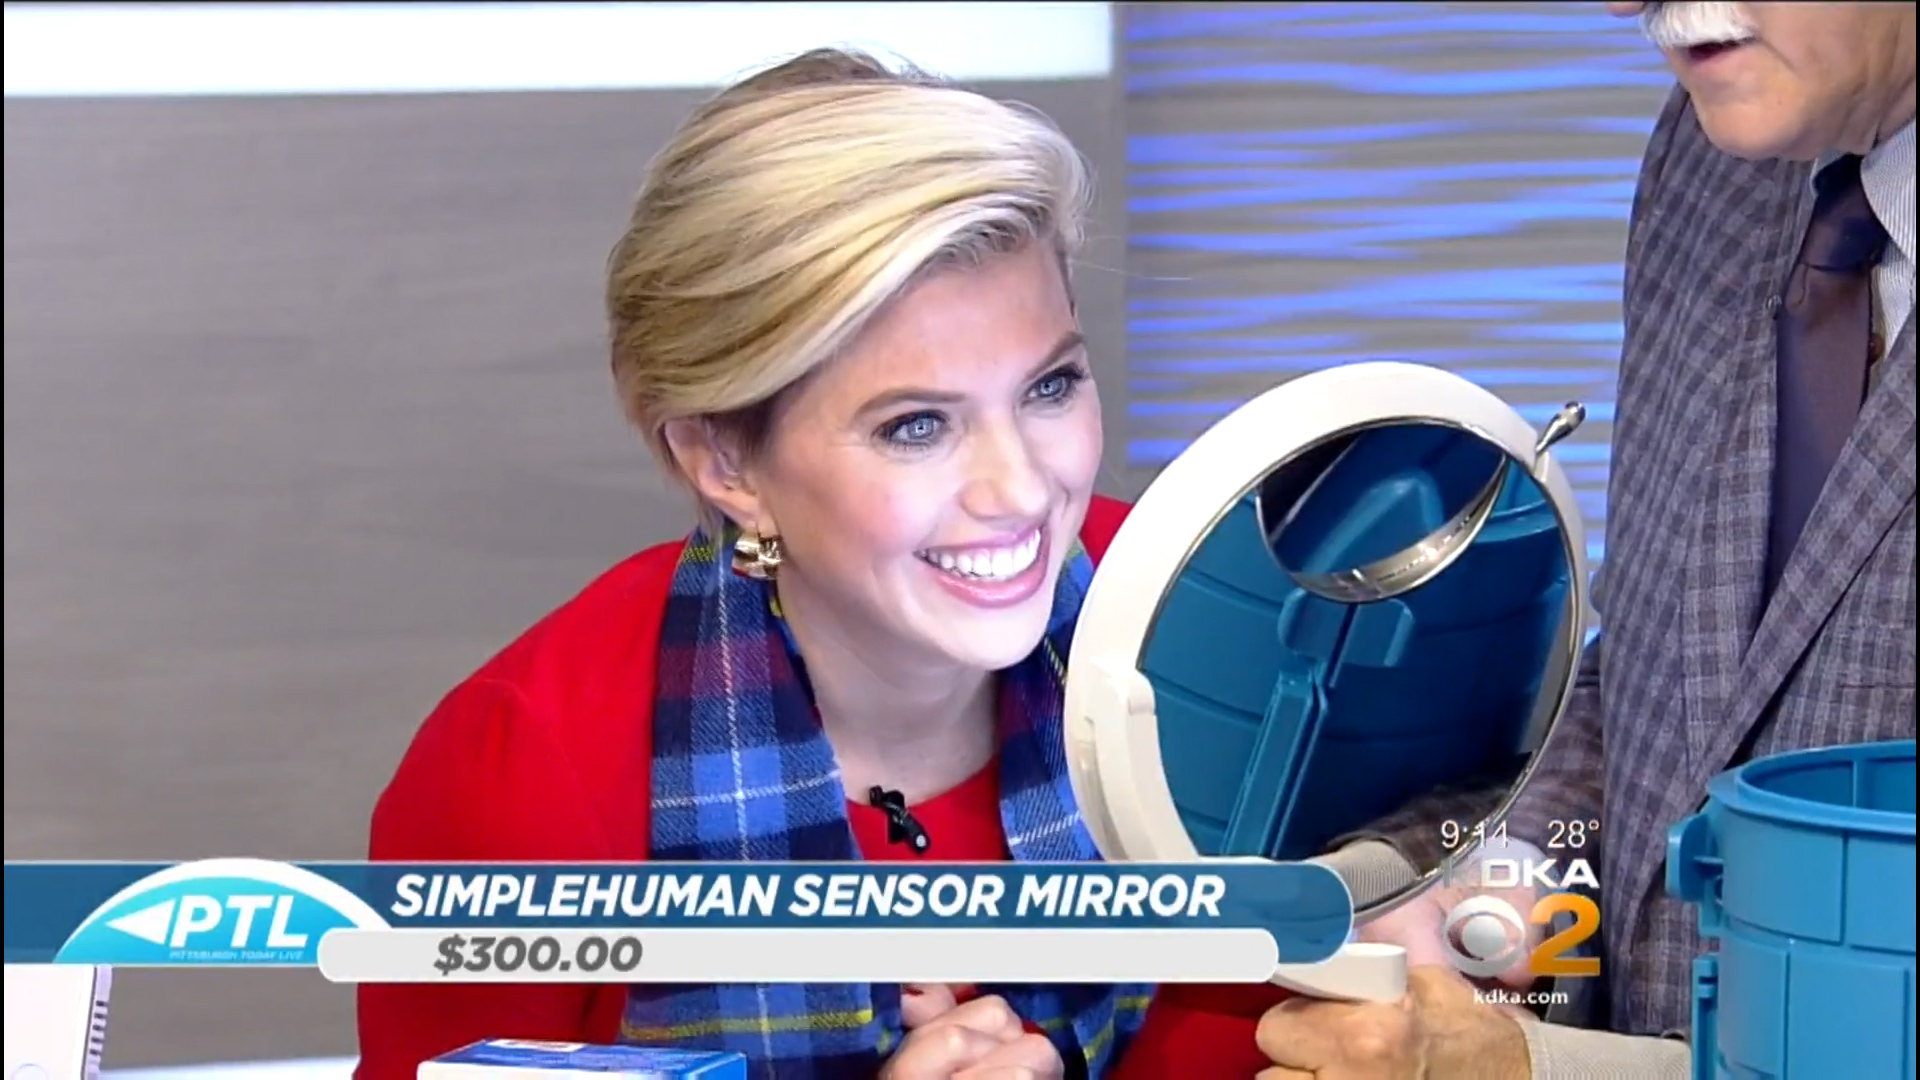 SIMPLEHUMAN SENSOR MIRROR TRIO - $300.00Shop Now